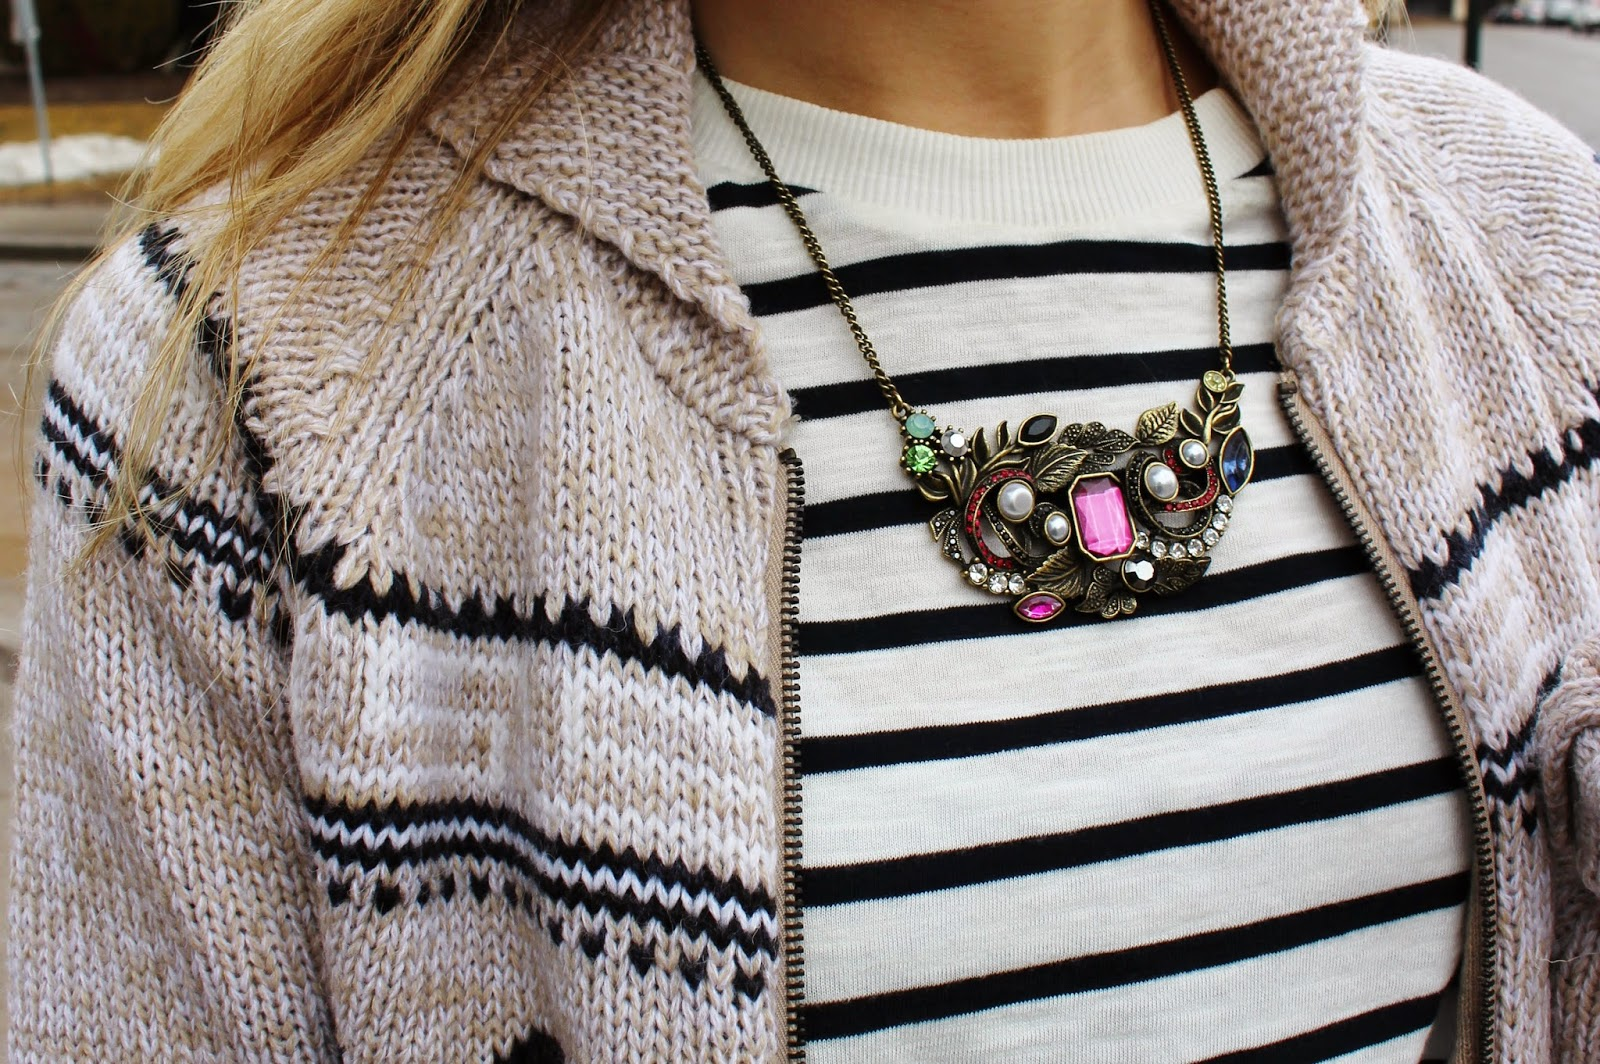 bijuleni,streetstyle,Zara,winter shorts, cardigan, winnersfabfind, stripe,fashion blogger, Calvin Klein, Accessorize, necklace